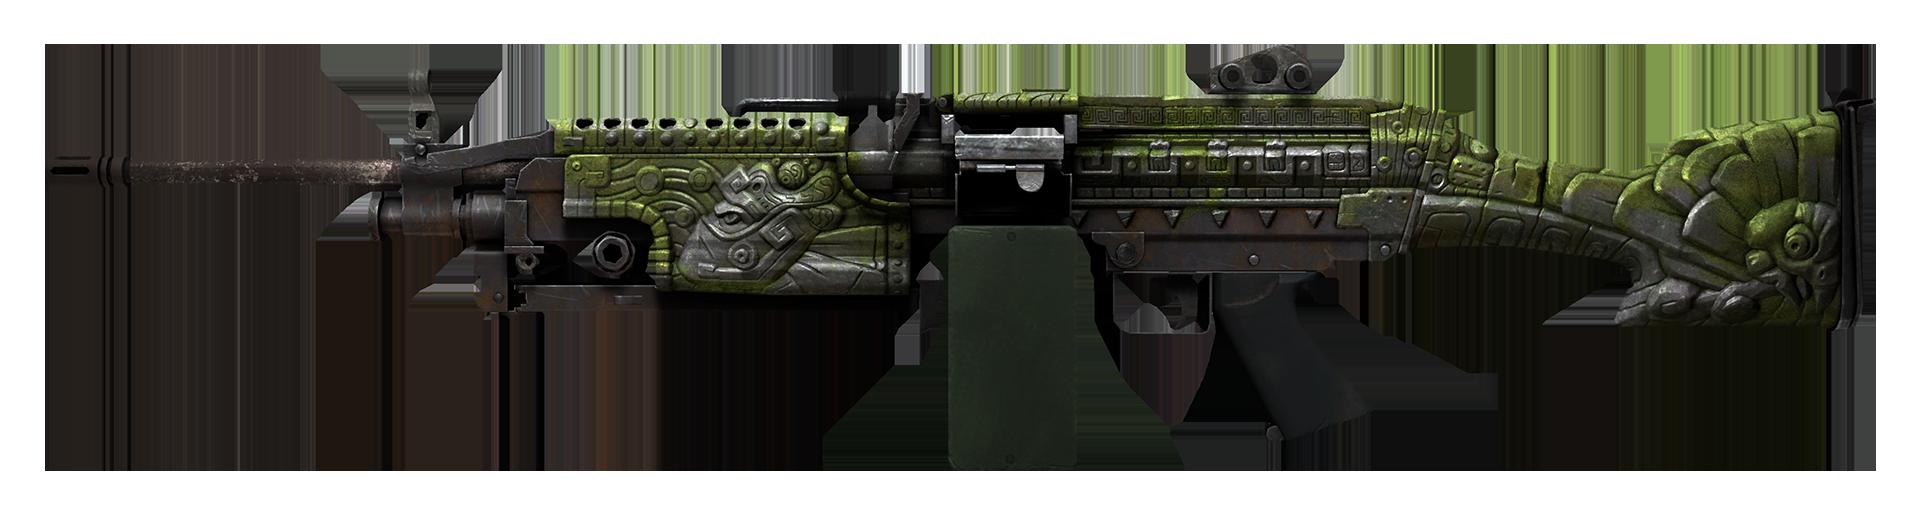 M249 Aztec Large Rendering